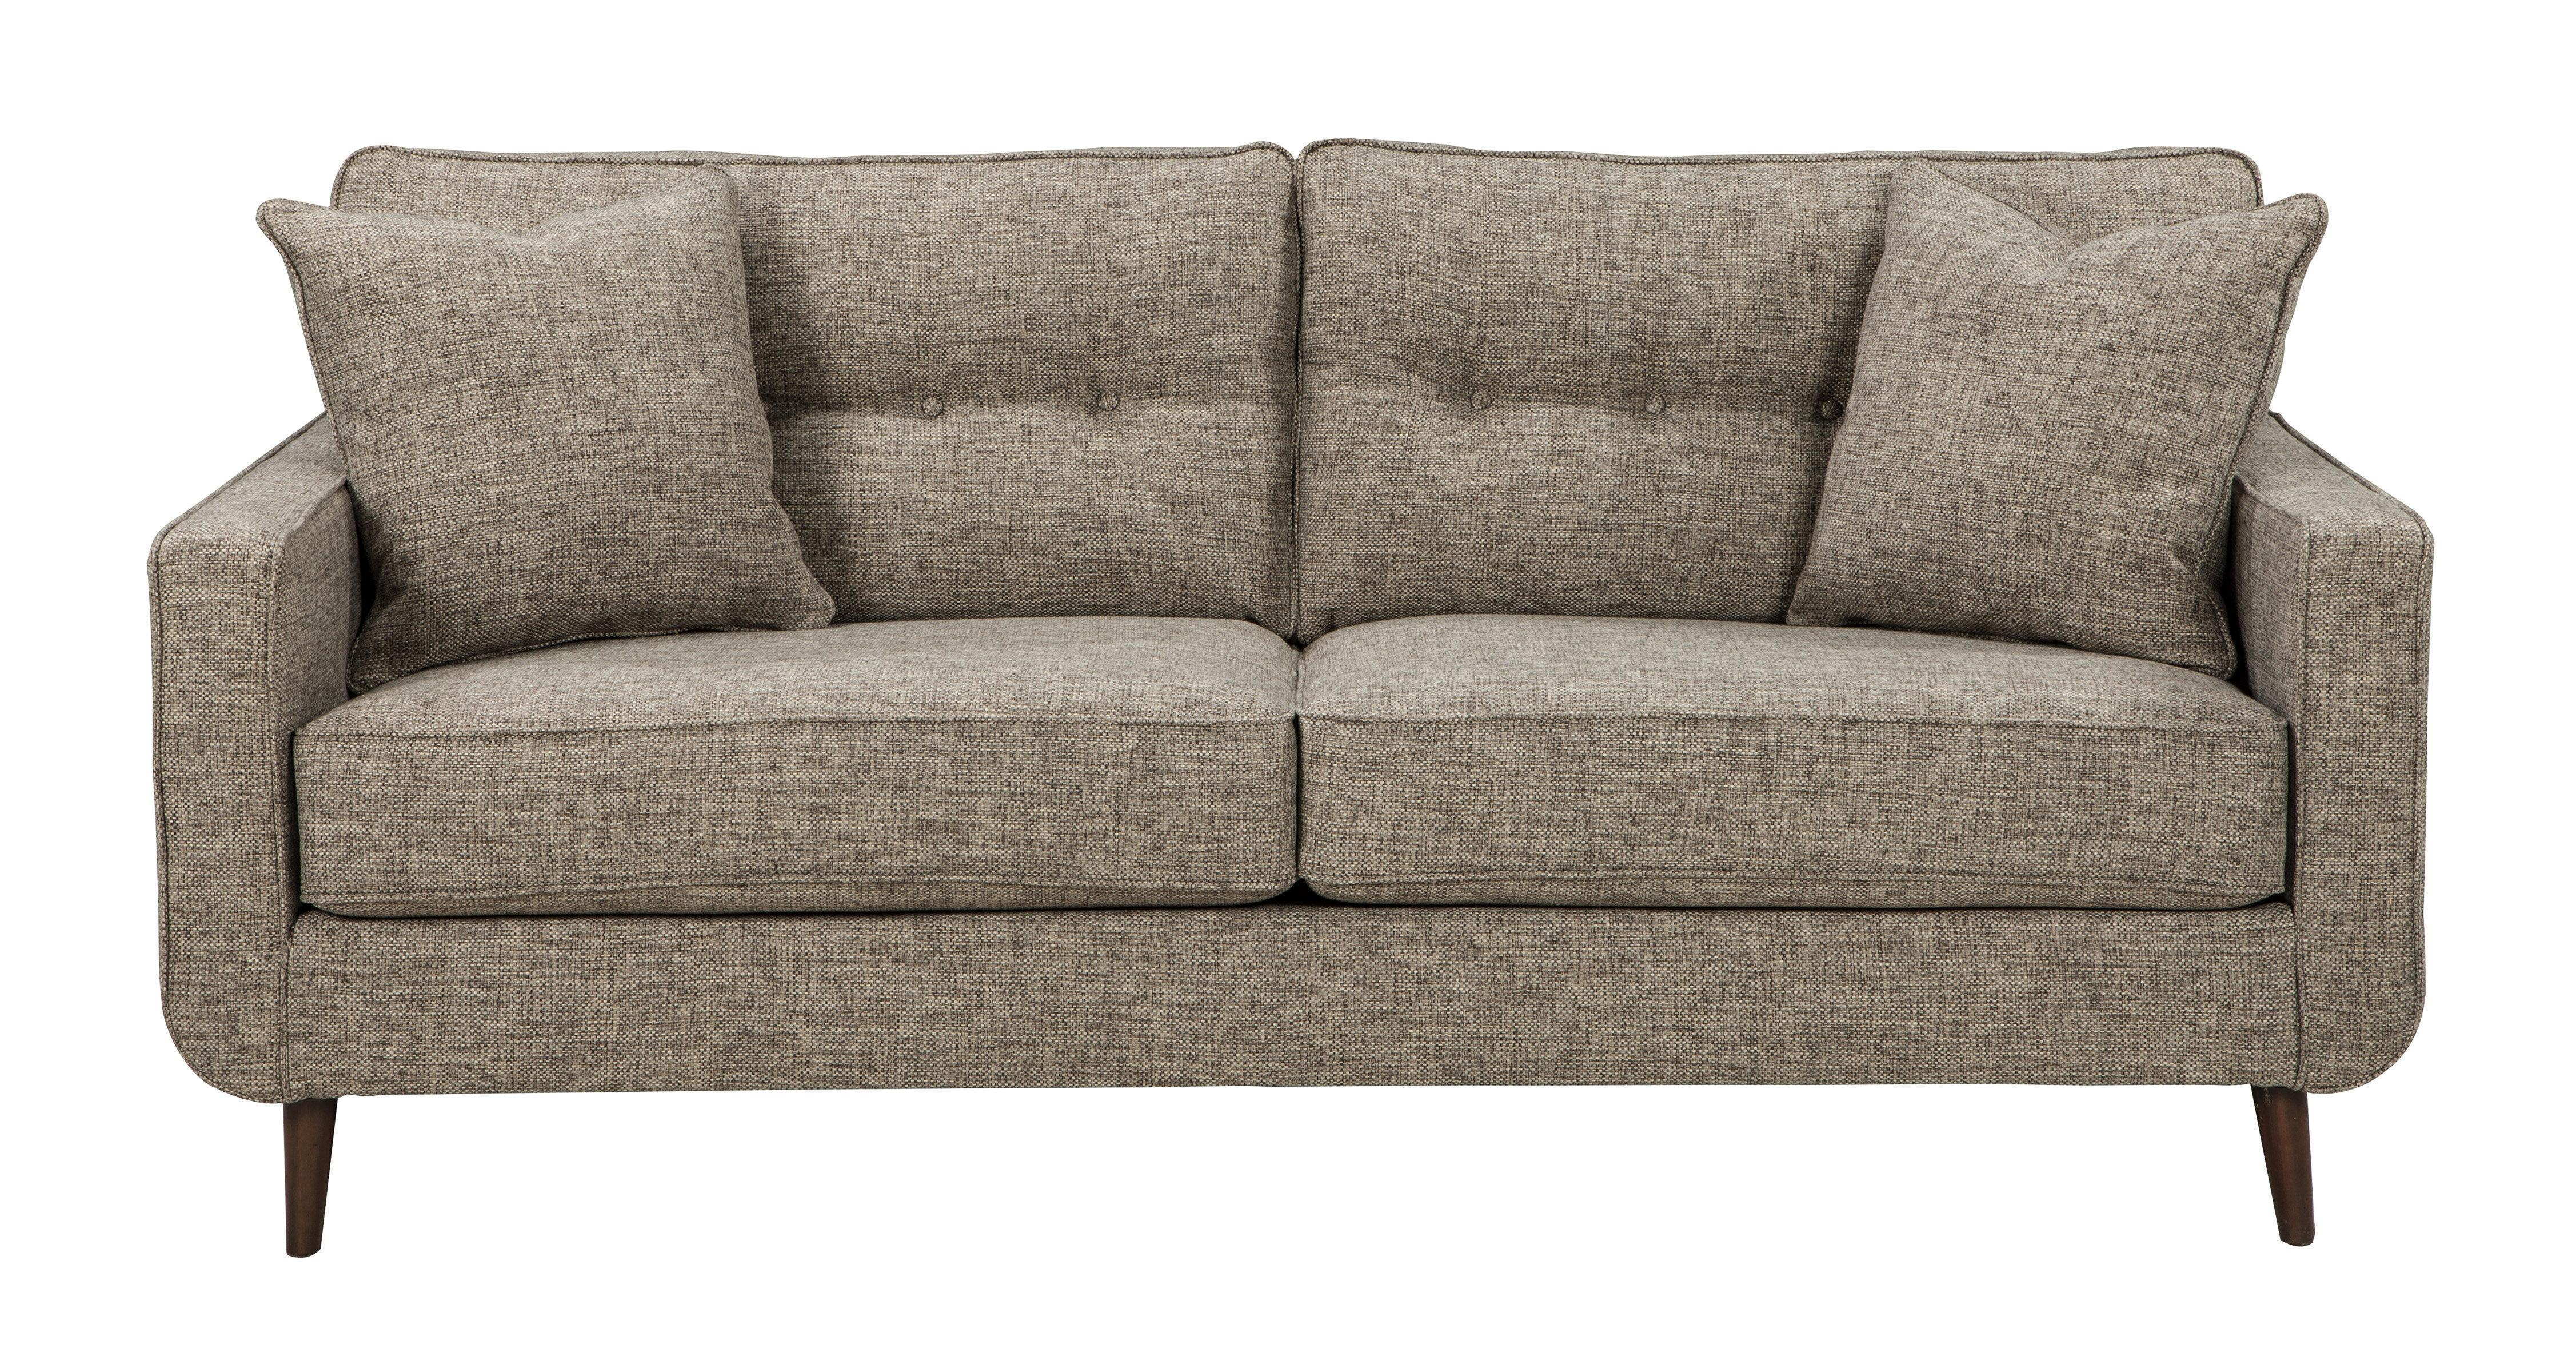 havana furniture beds sofa mataro migliore loveseat bamboo bed